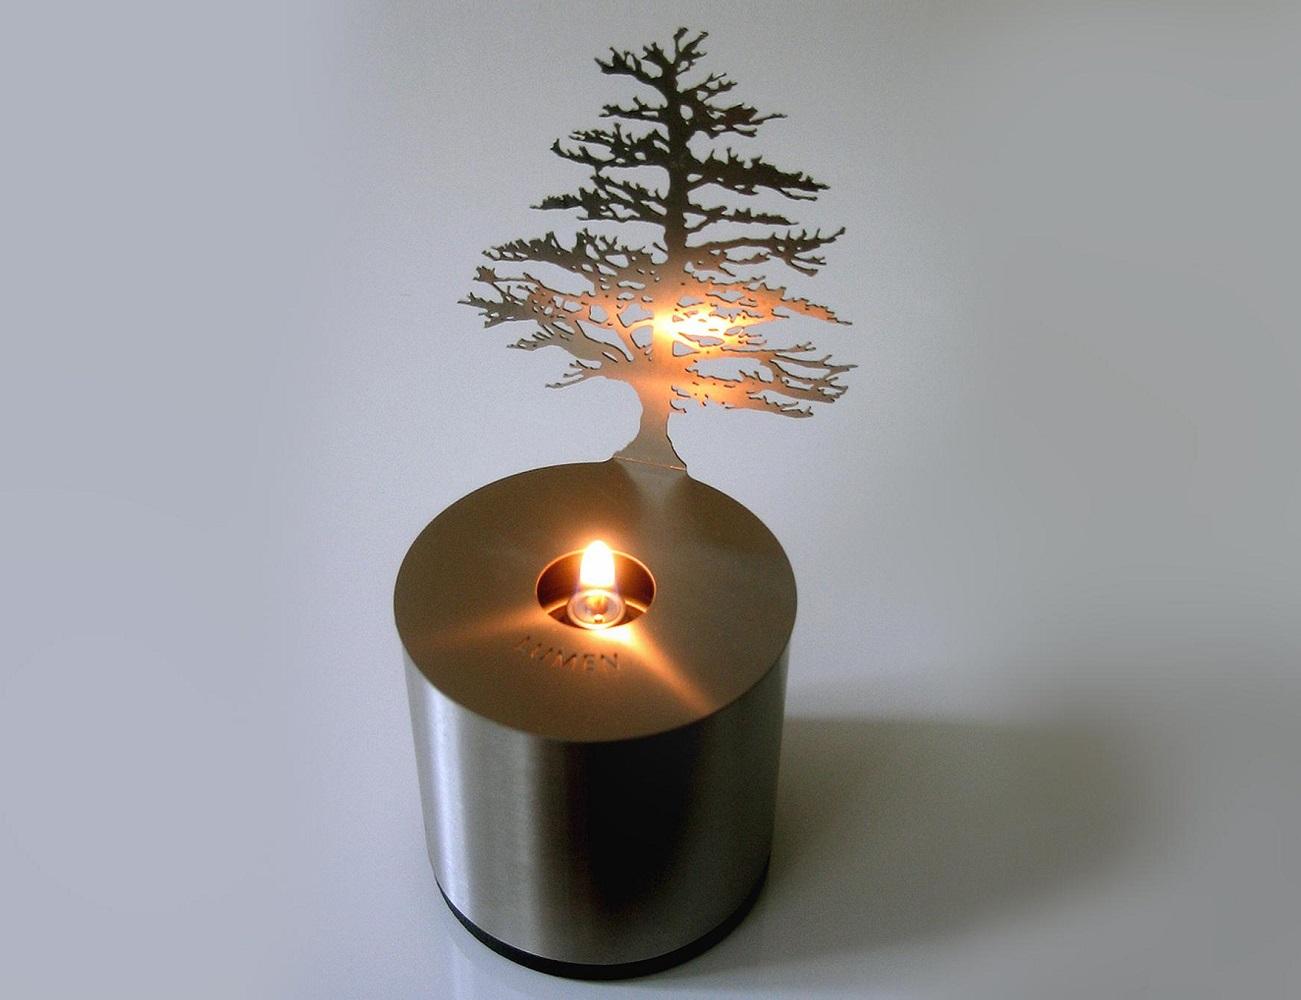 Lumen Flame Tree Oil Lamp